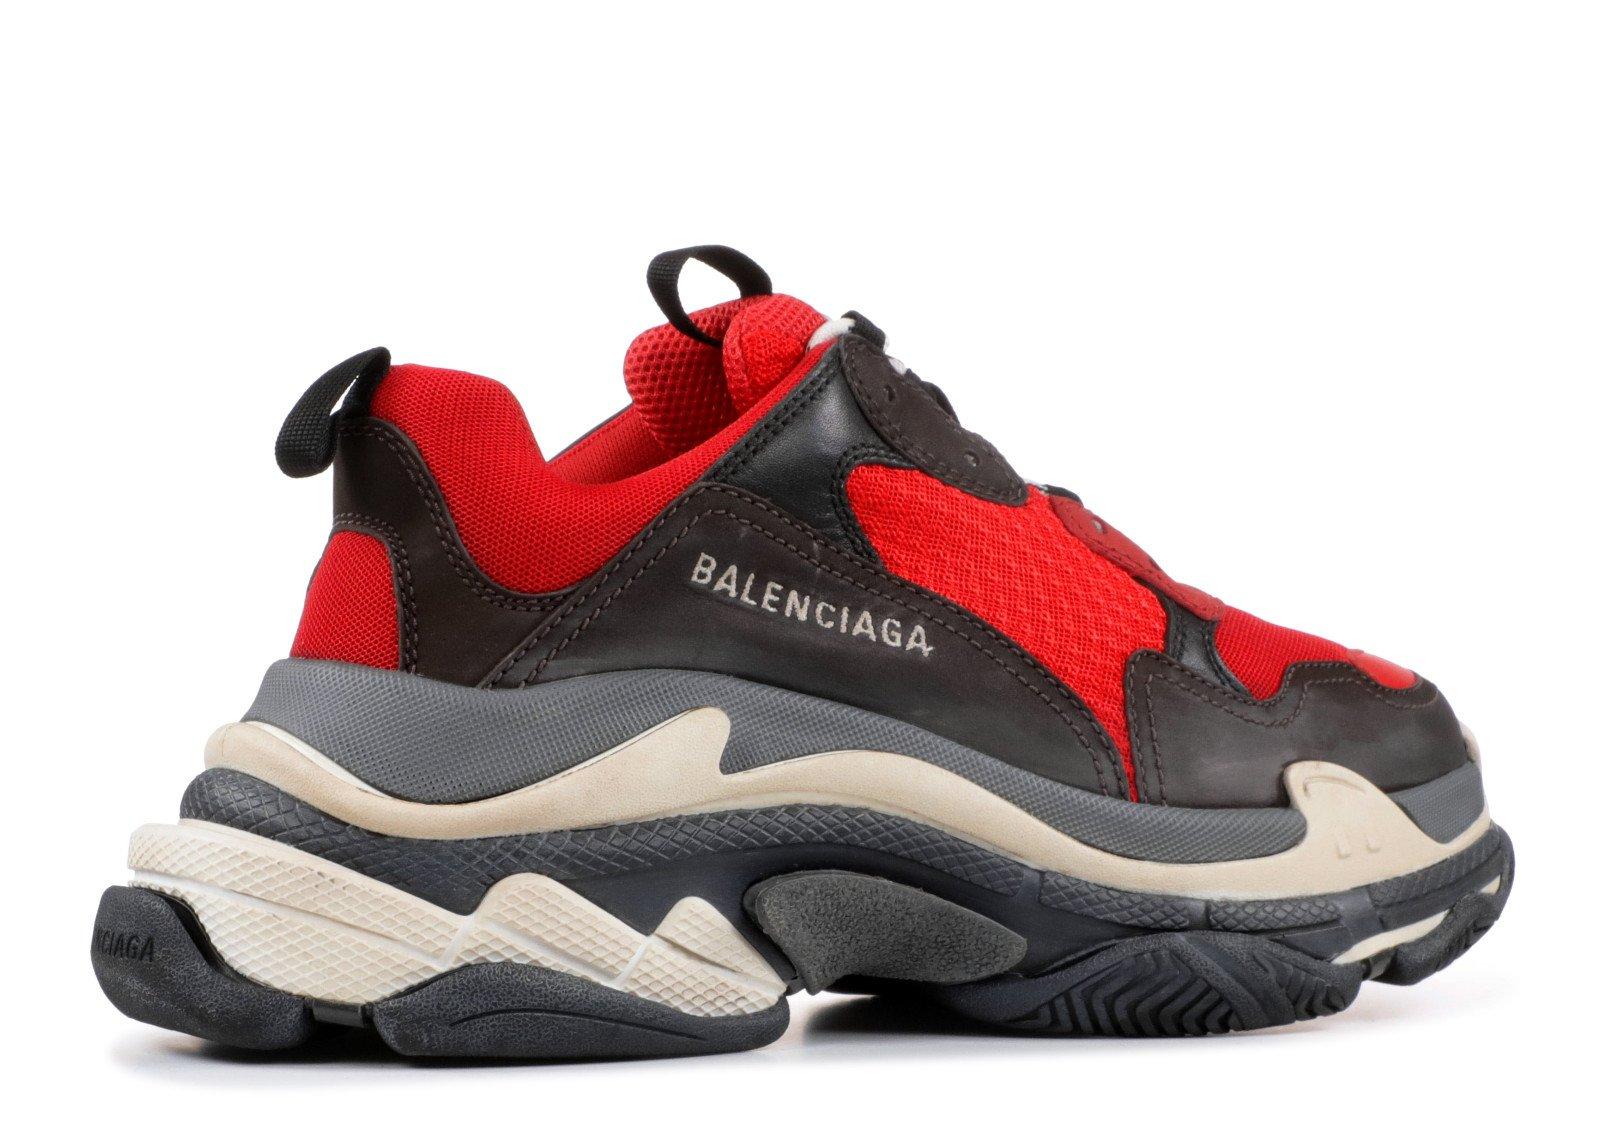 BALENCiAGA Men s Triple S Mesh Leather Sneakers Black